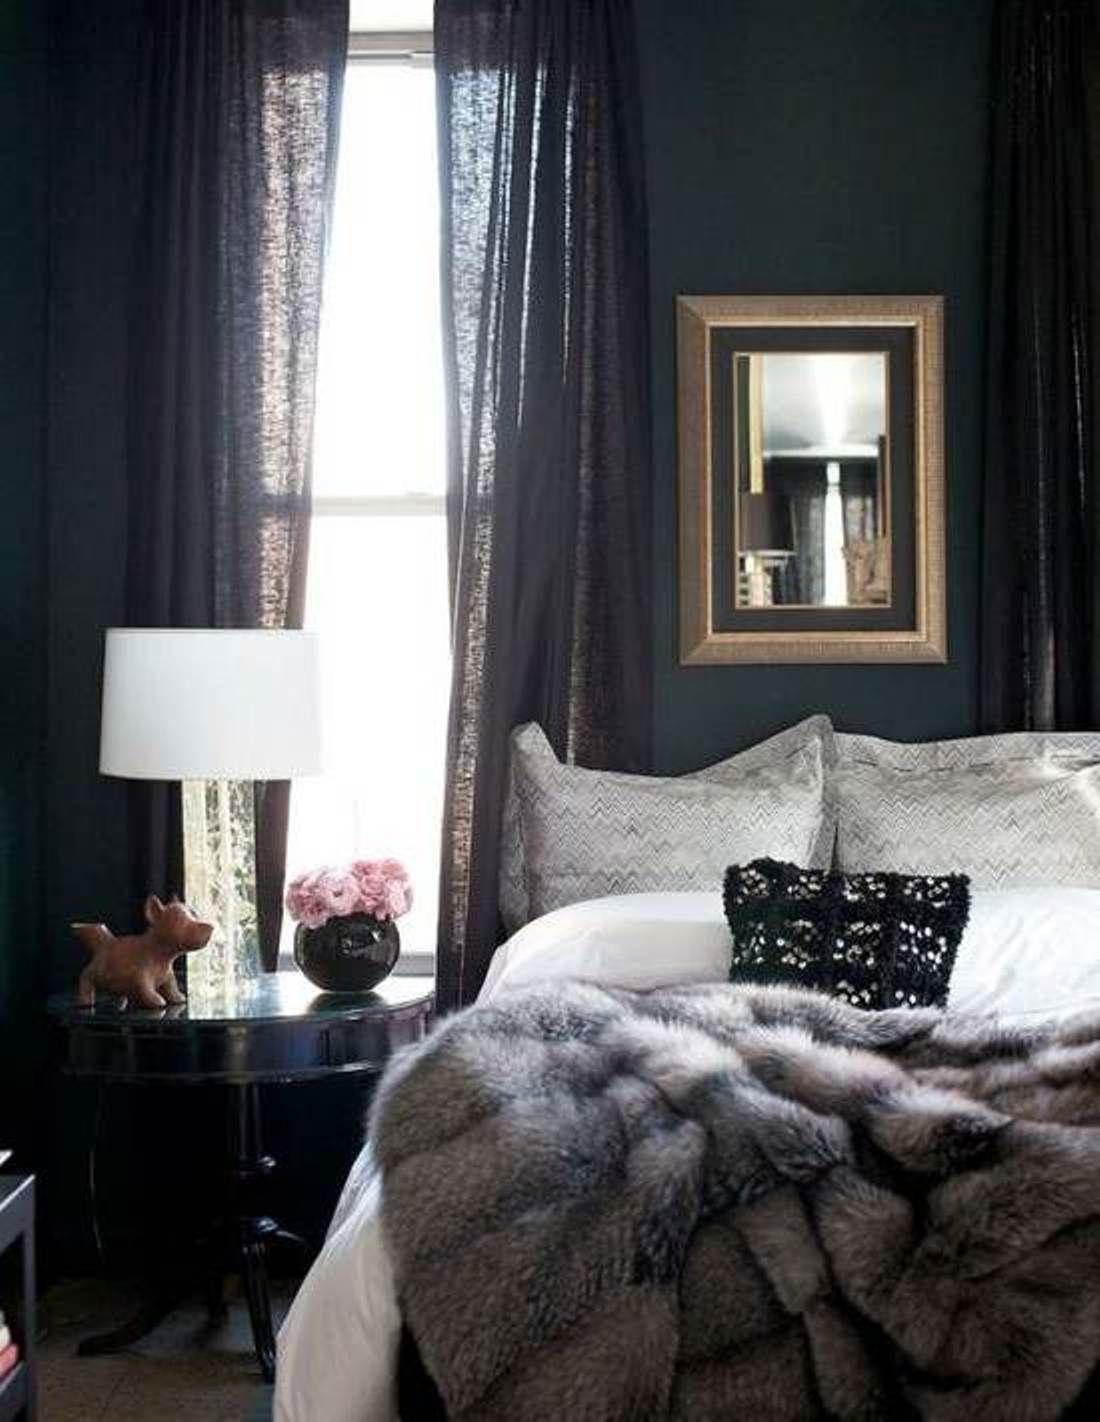 Deep Colors Adult Bedroom Ideas  The Boudoir  Pinterest  Adult Amazing Adult Bedroom Ideas 2018